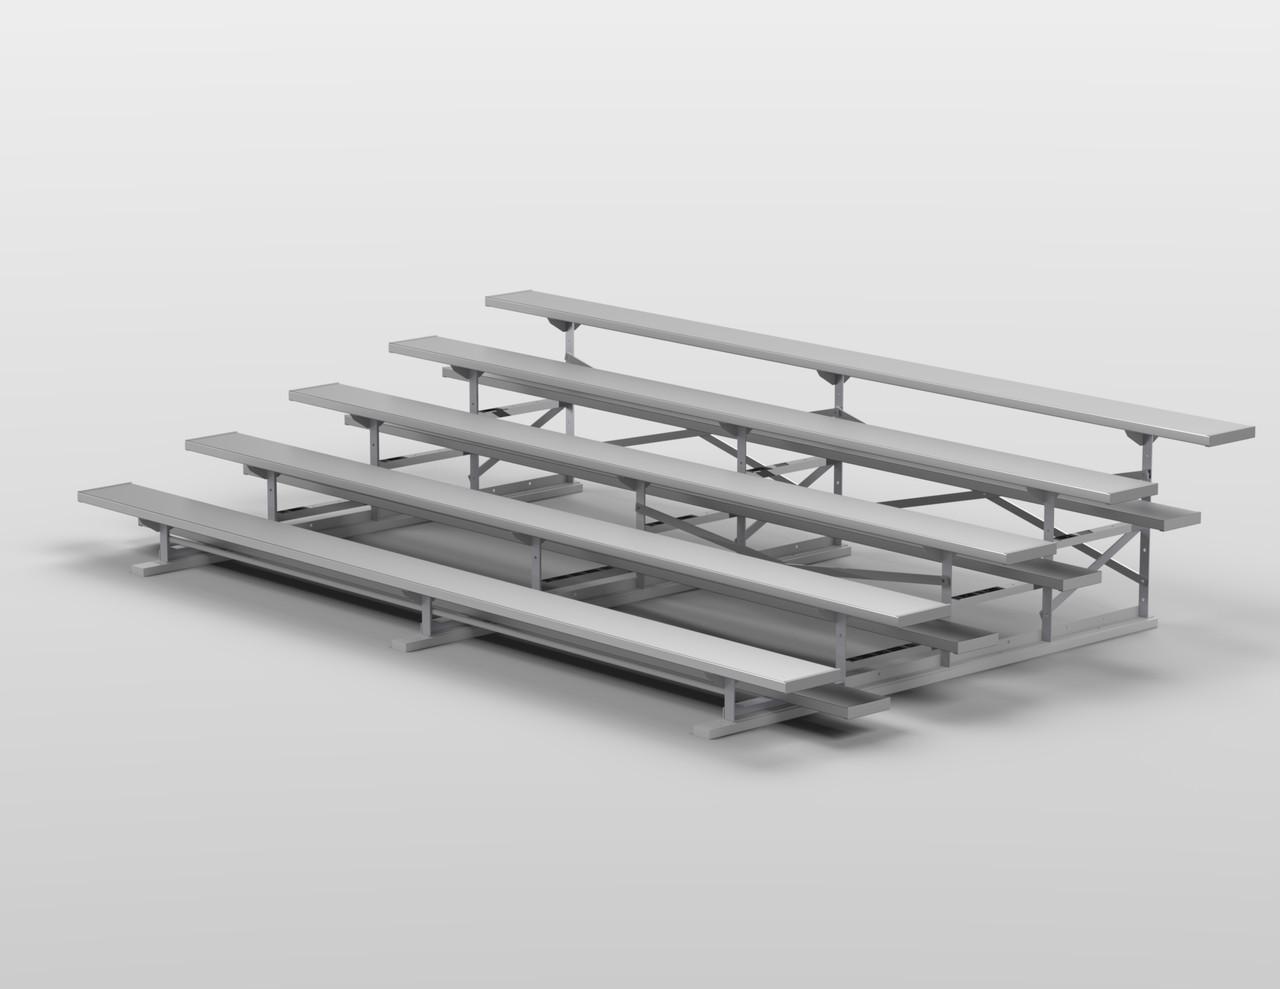 5 Row Aluminum Bleacher | 21' Length | Seats 70